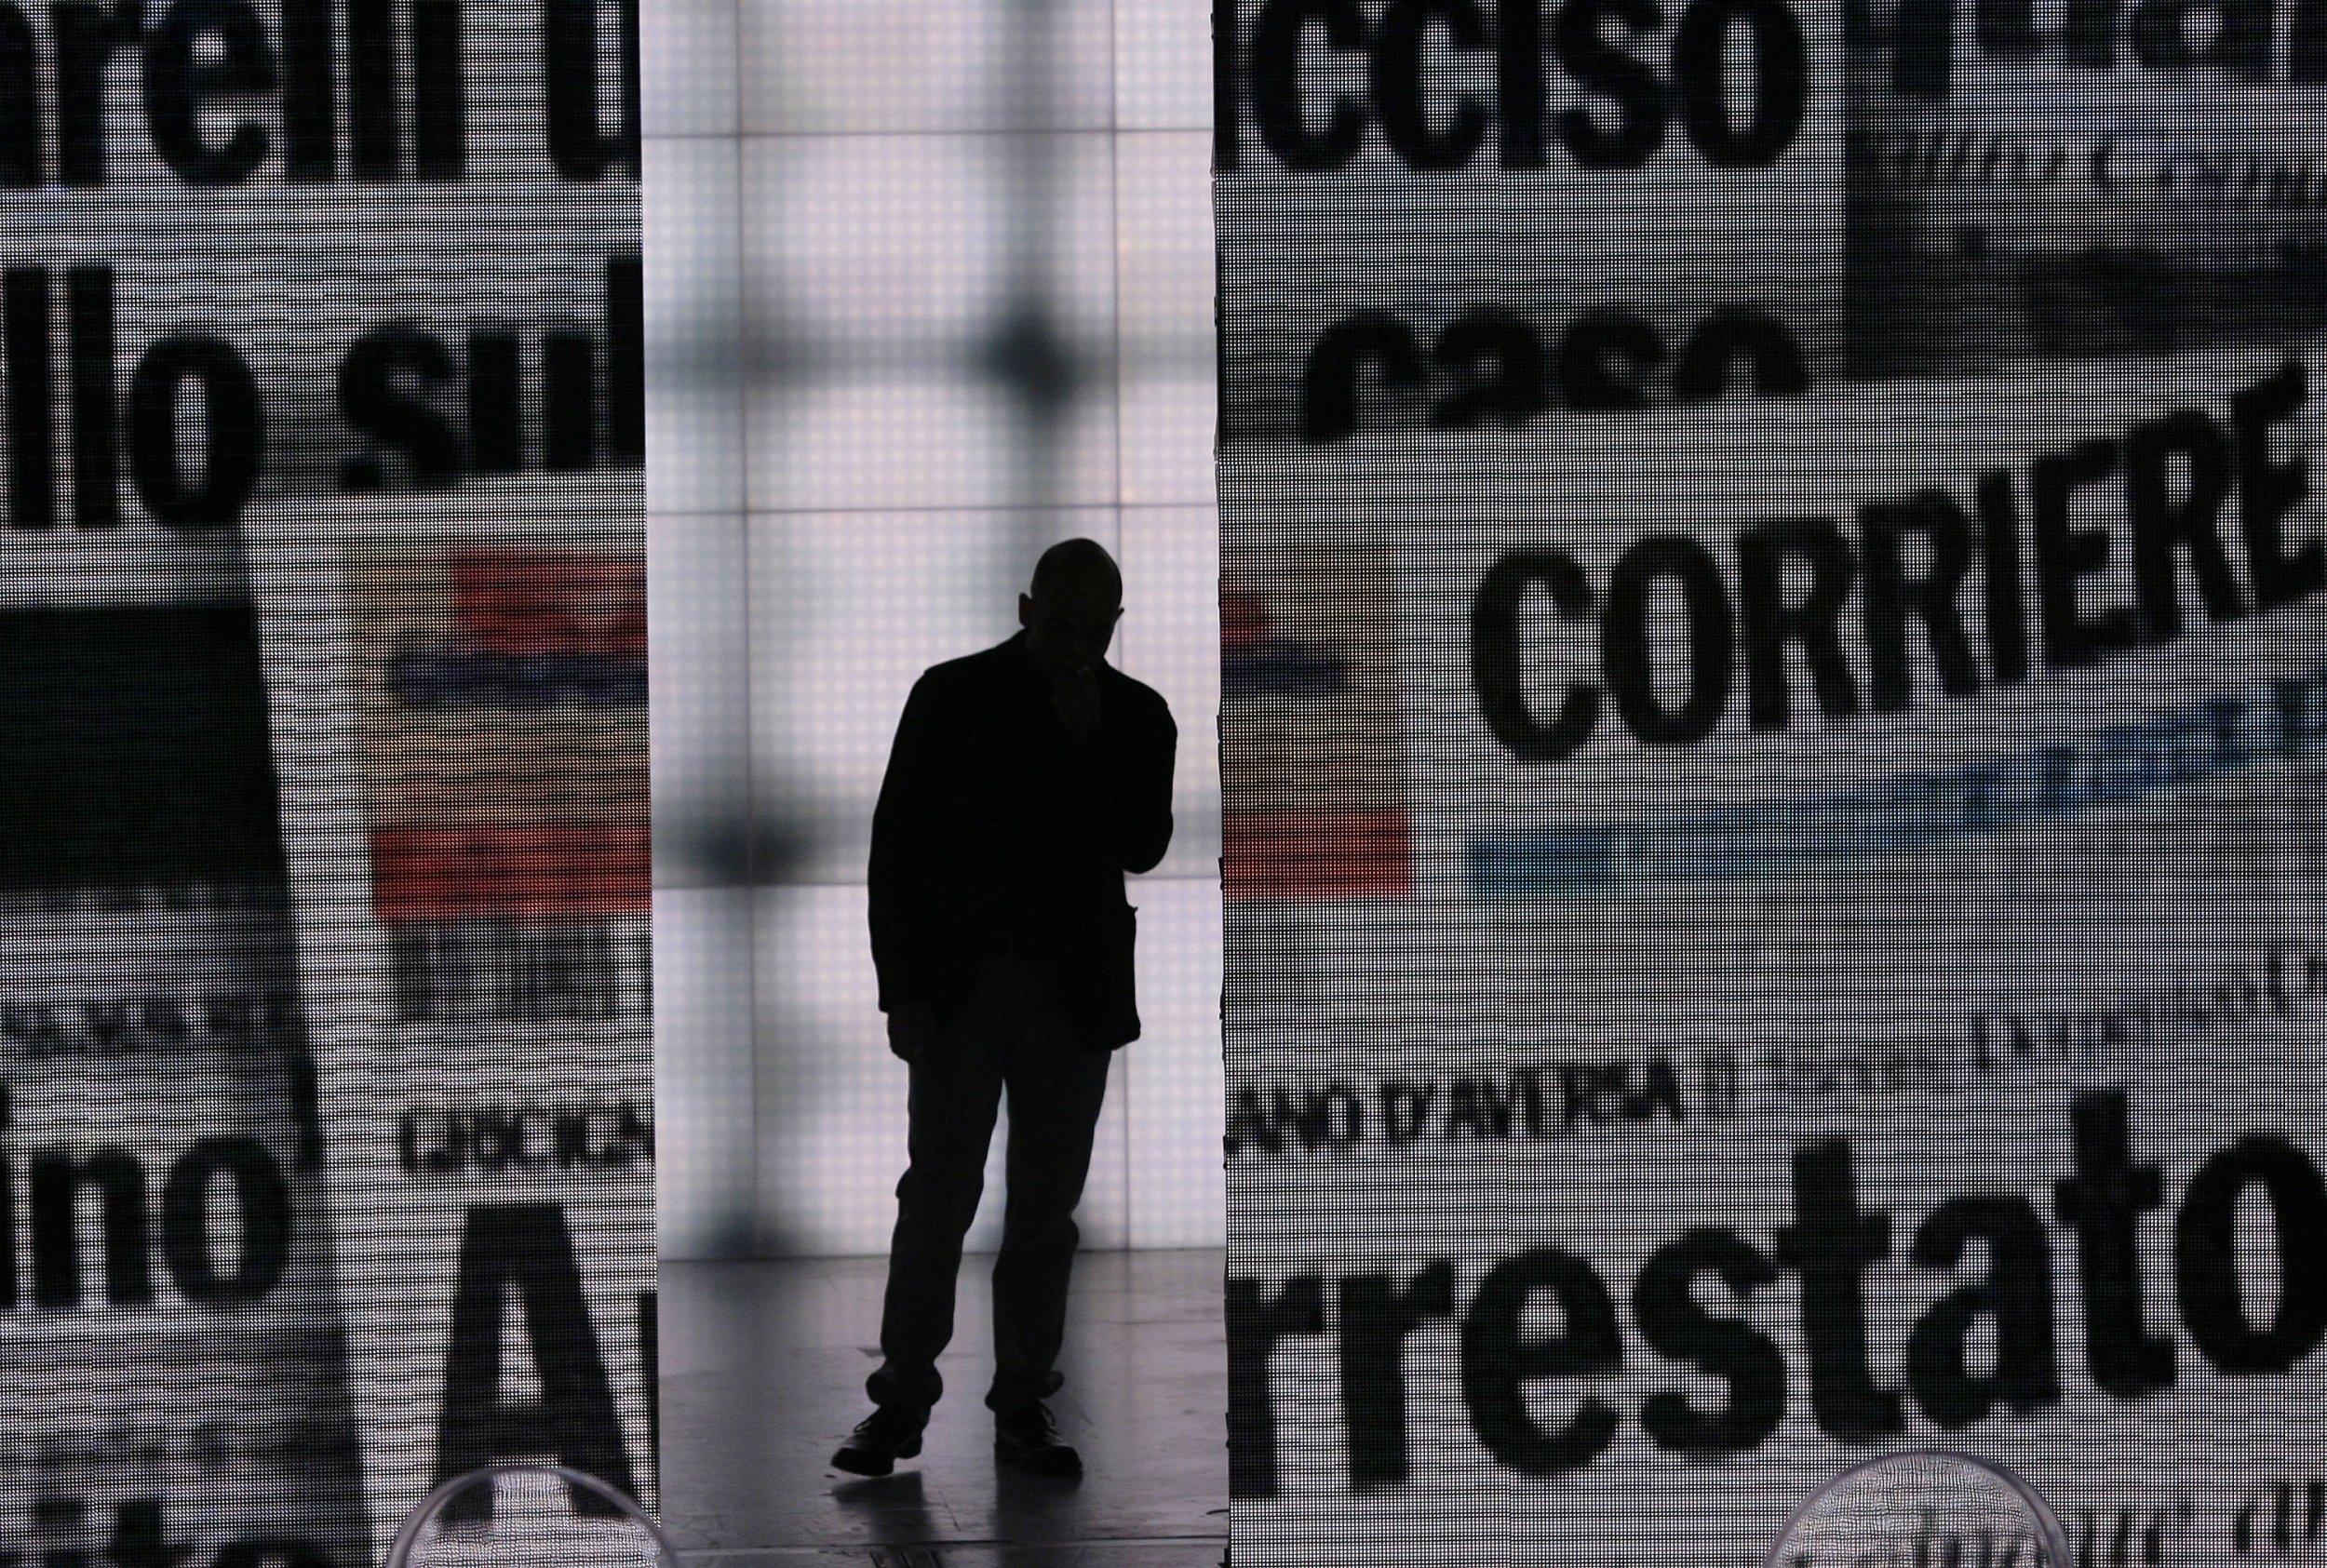 Italian Mafia Intimidating Journalists With Worst Levels